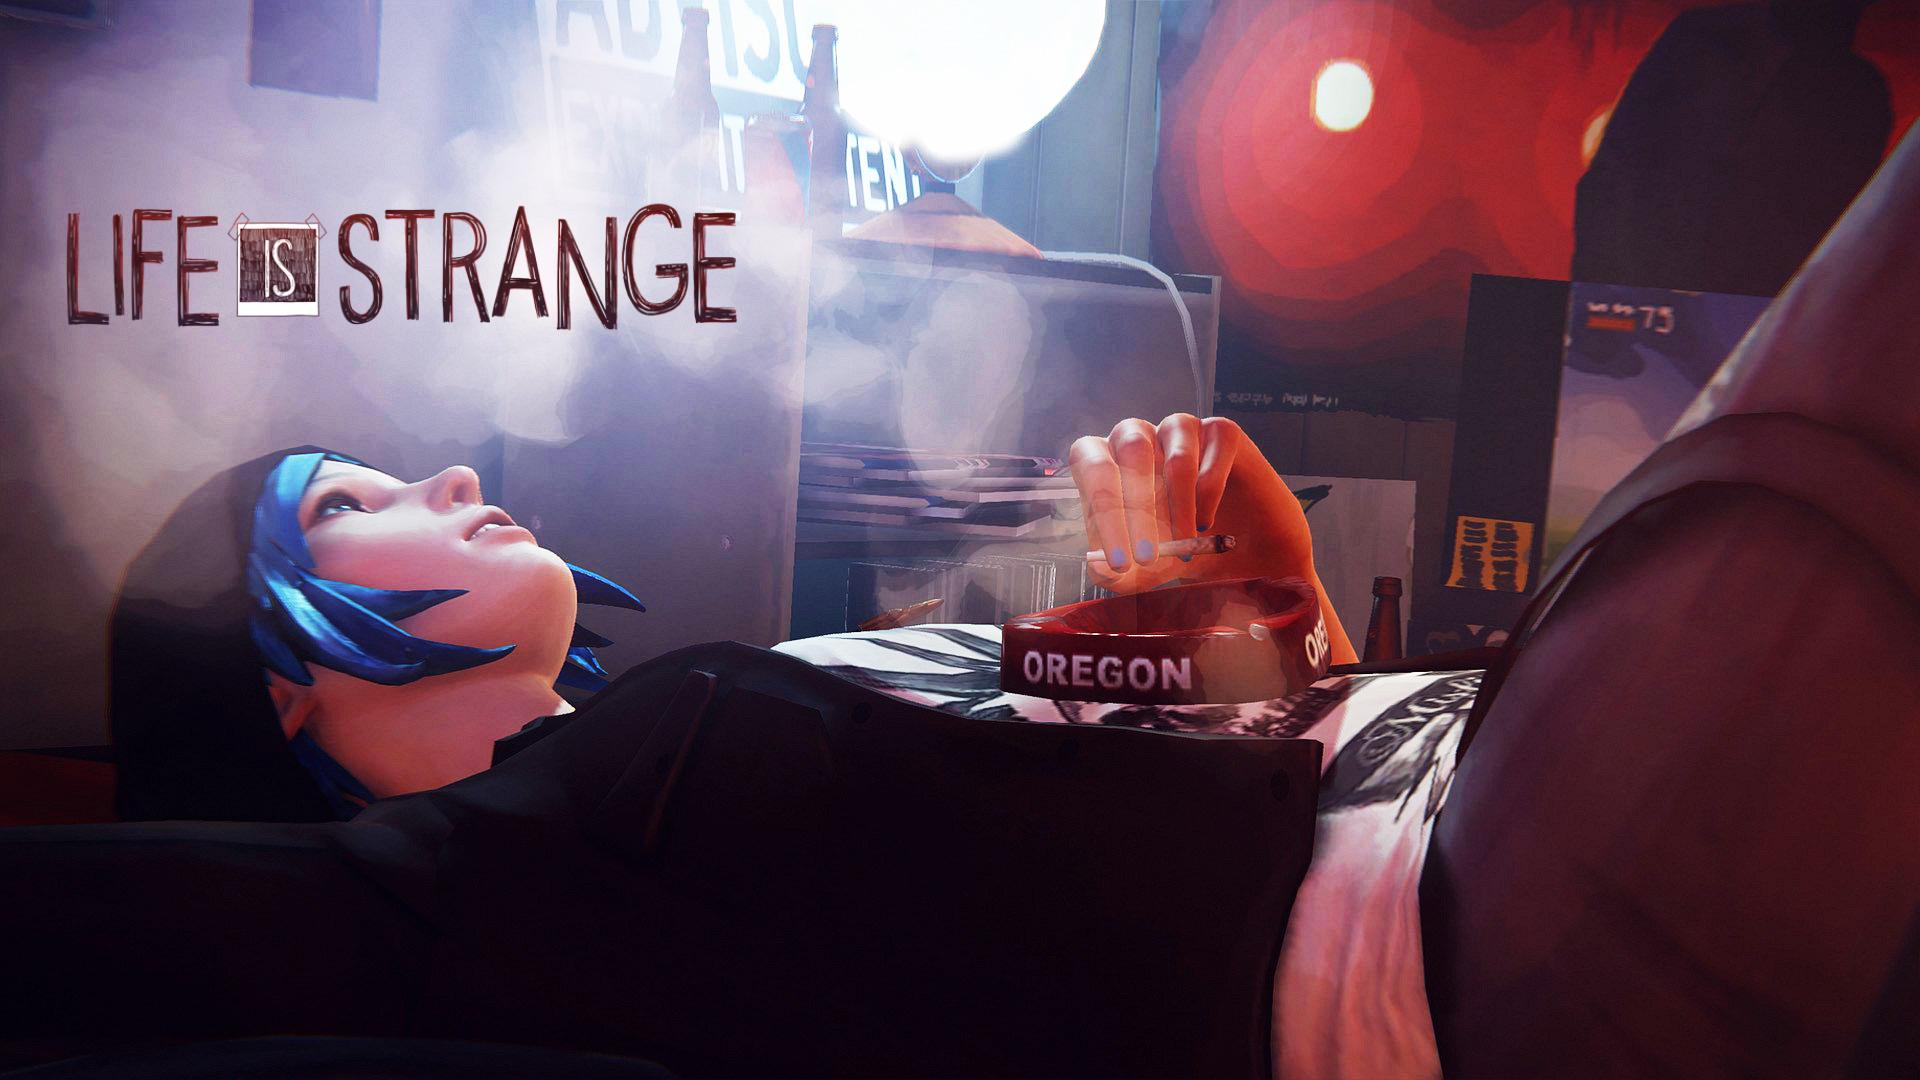 Life Is Strange - Chloe's Thinking Time by KateWindhelm